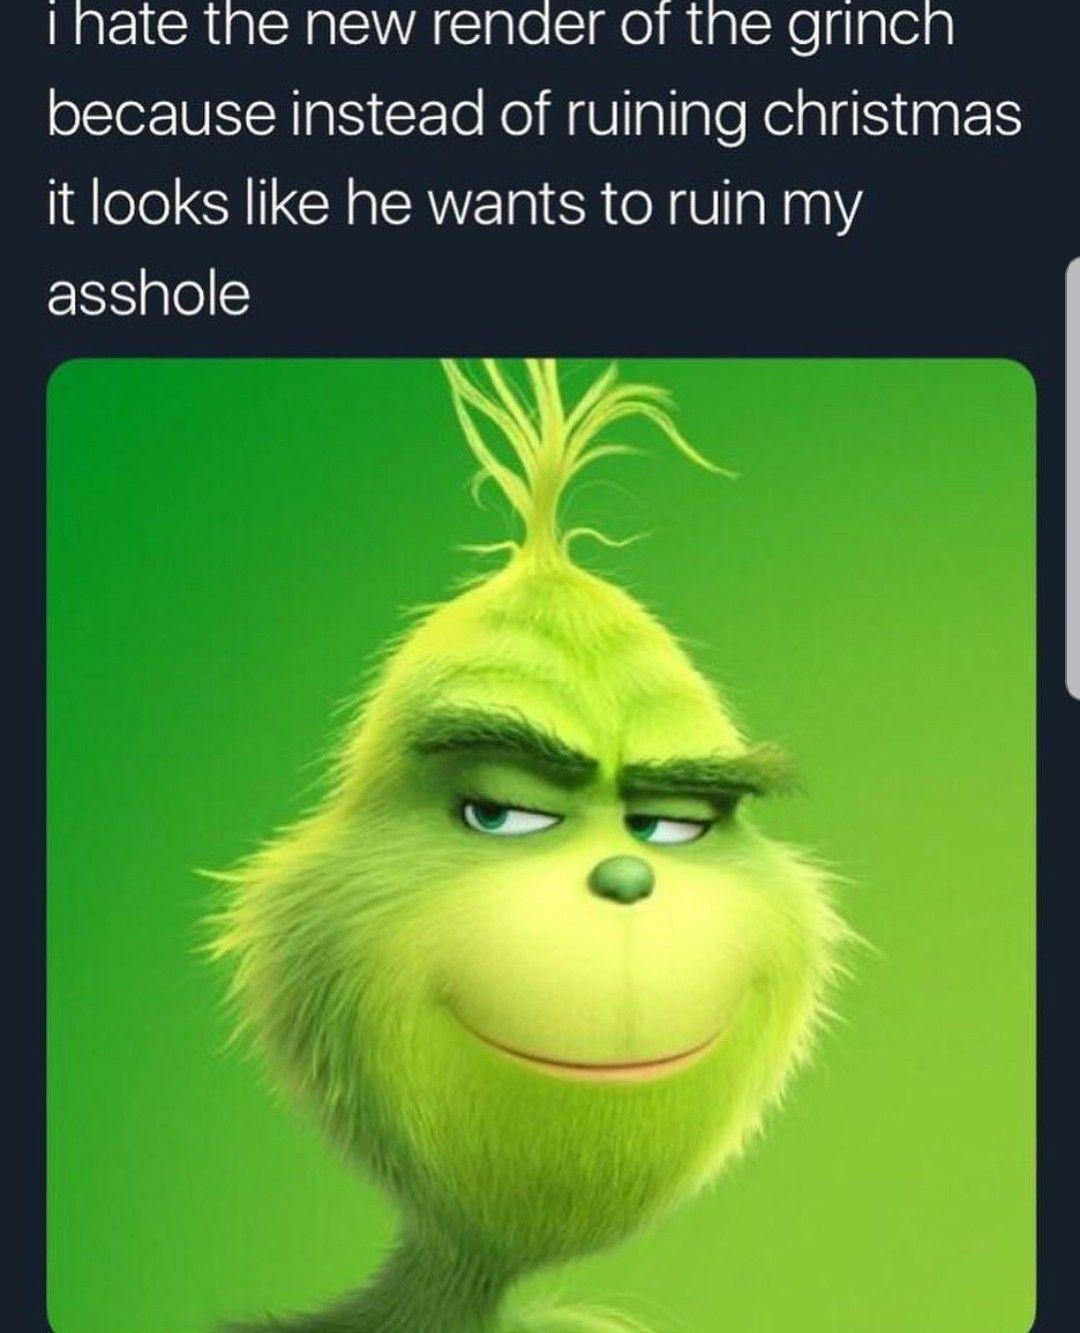 Grinch The grinch movie, Memes, Grinch